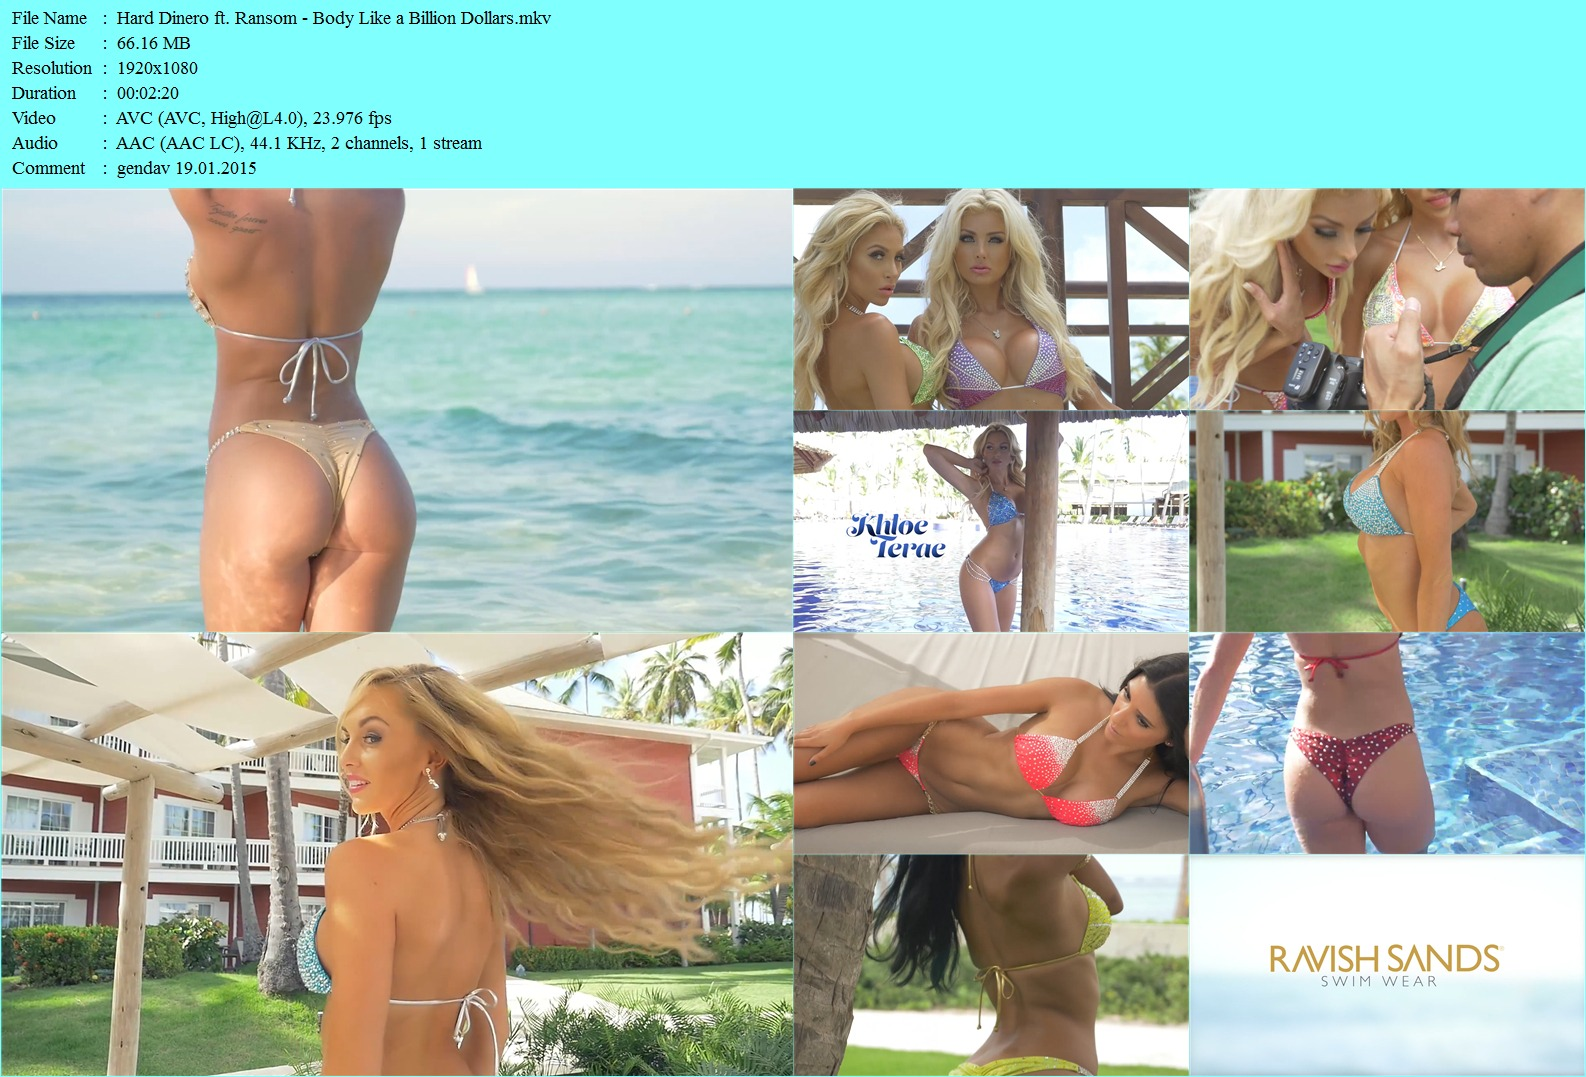 http://4put.ru/pictures/max/1067/3278980.jpg